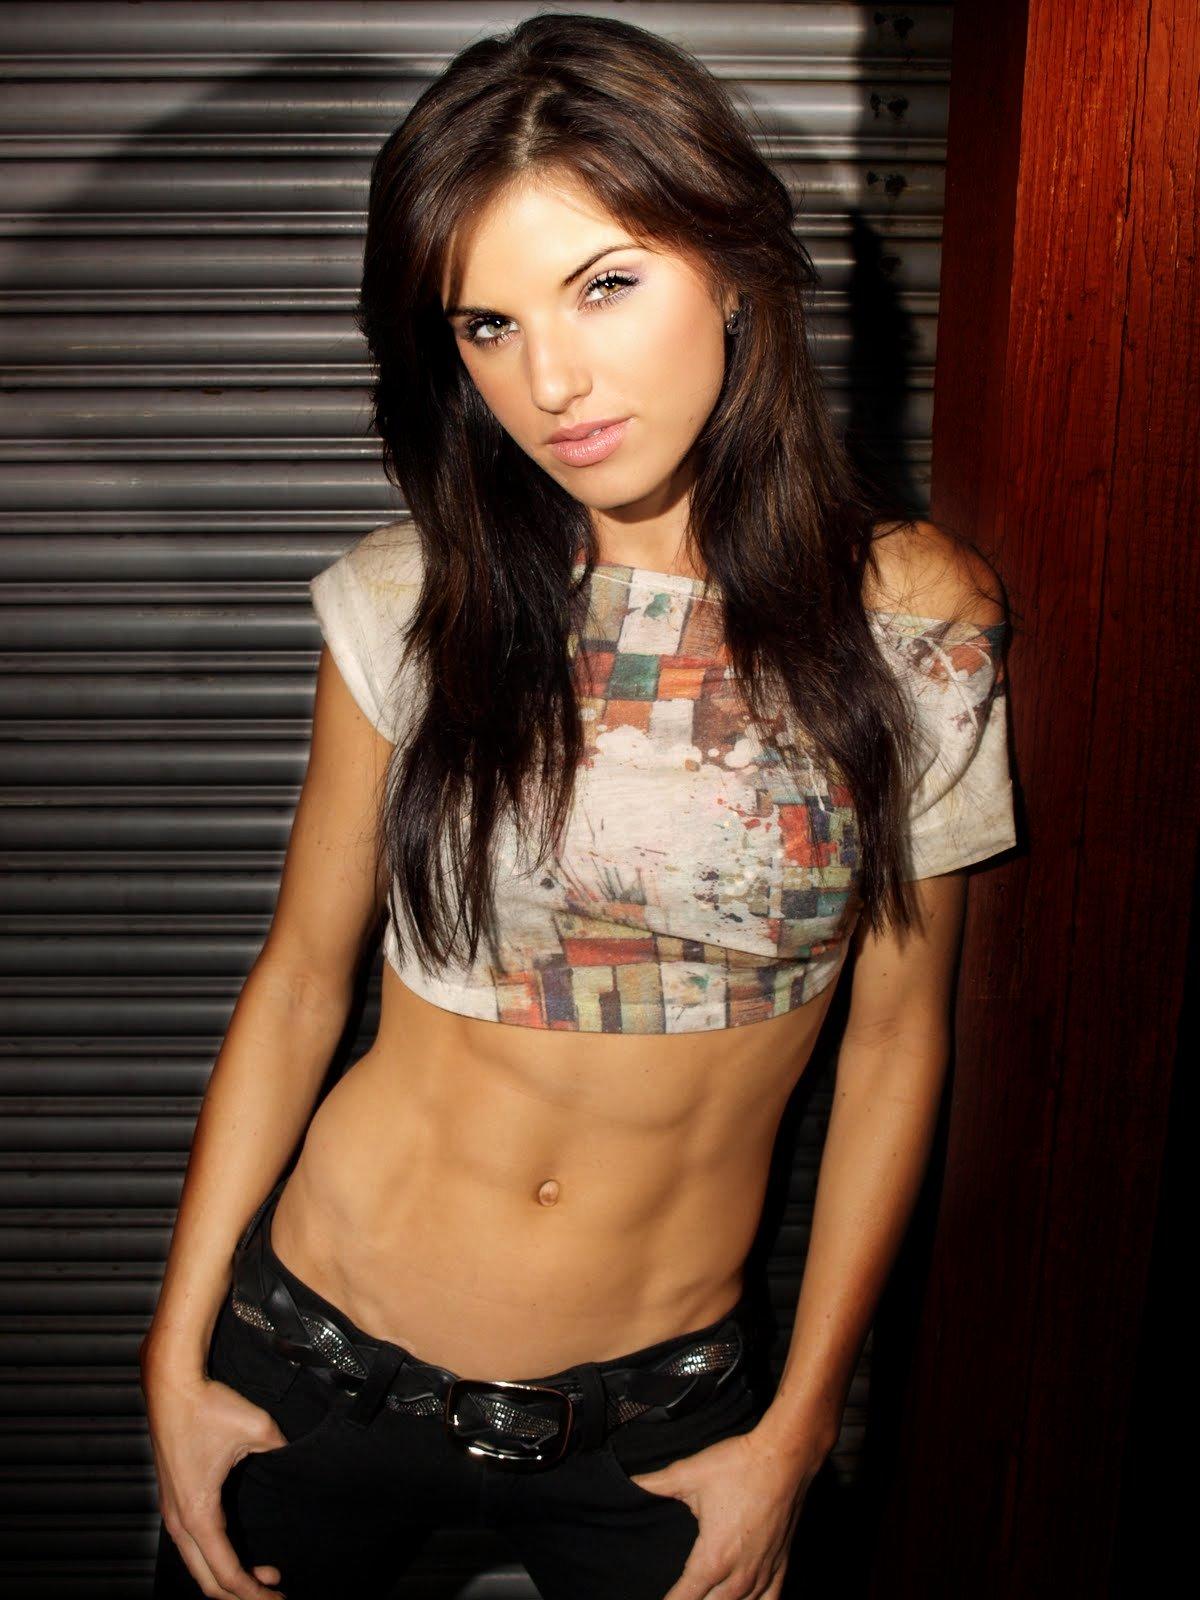 http://2.bp.blogspot.com/-v6T4Jqc-Vng/ToInSUmd0HI/AAAAAAAAEPw/L5Zm_elAgJ0/s1600/Rachele+Brooke+Smith+1.jpg